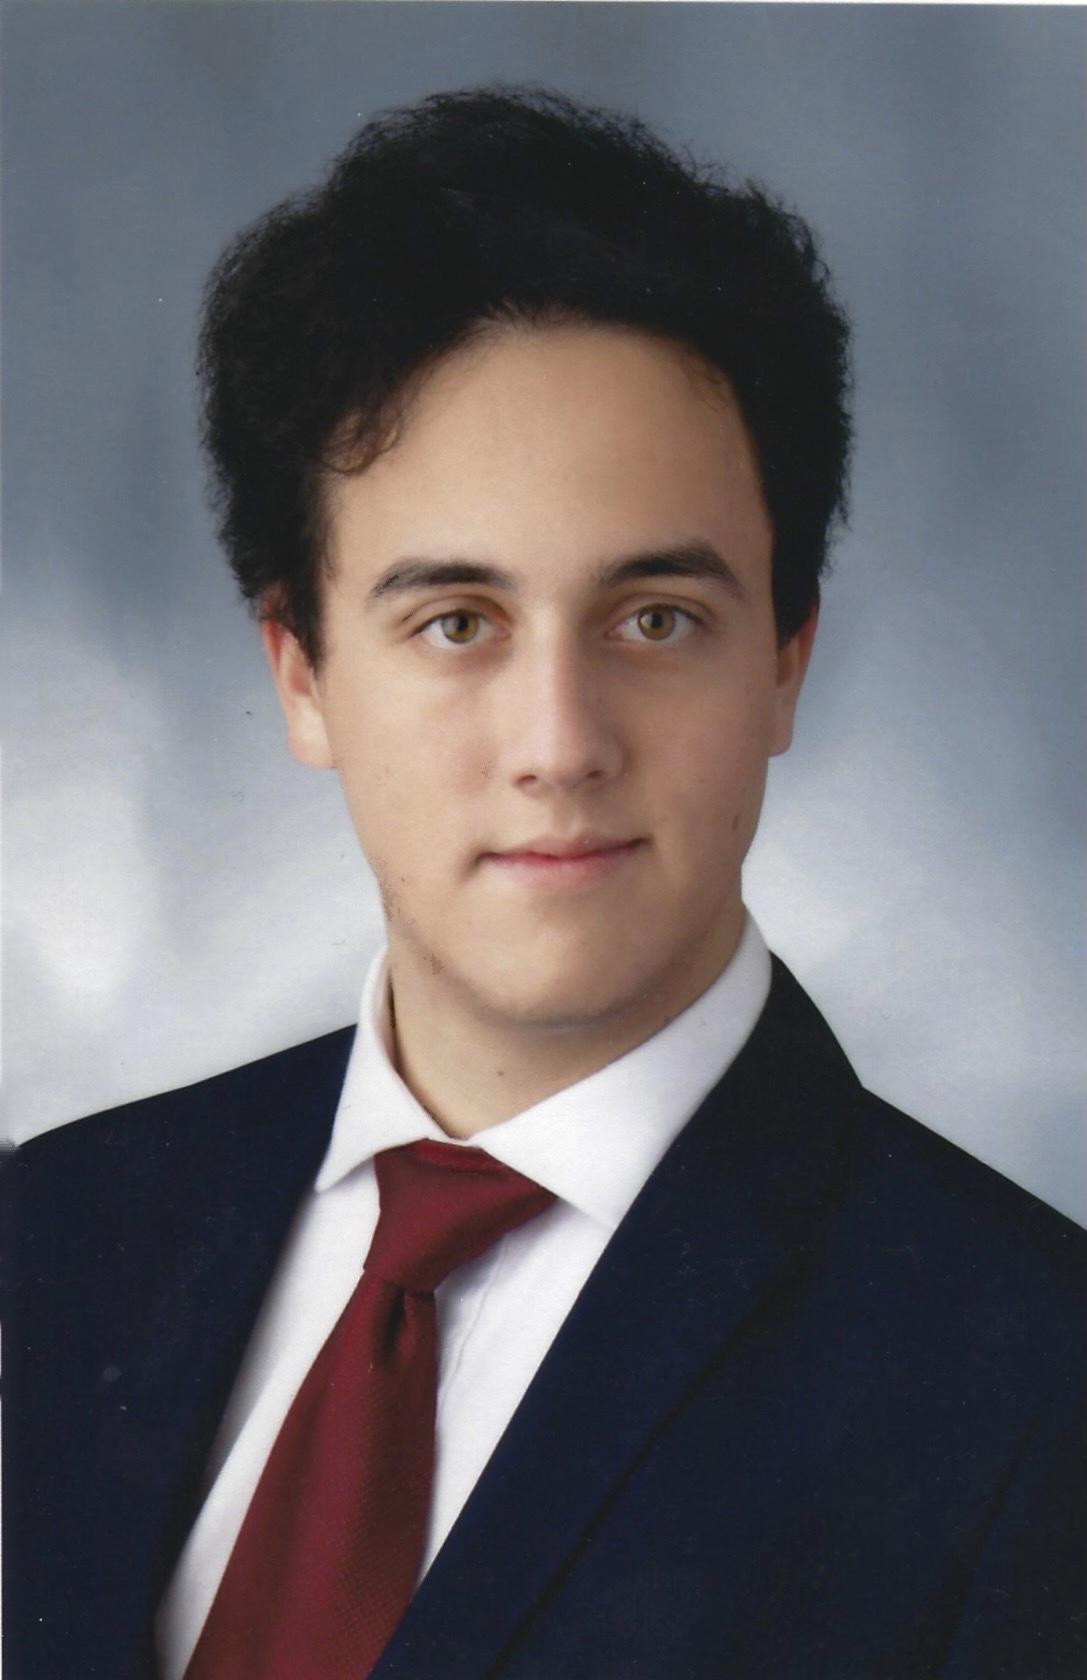 Németh Csongor Gergely